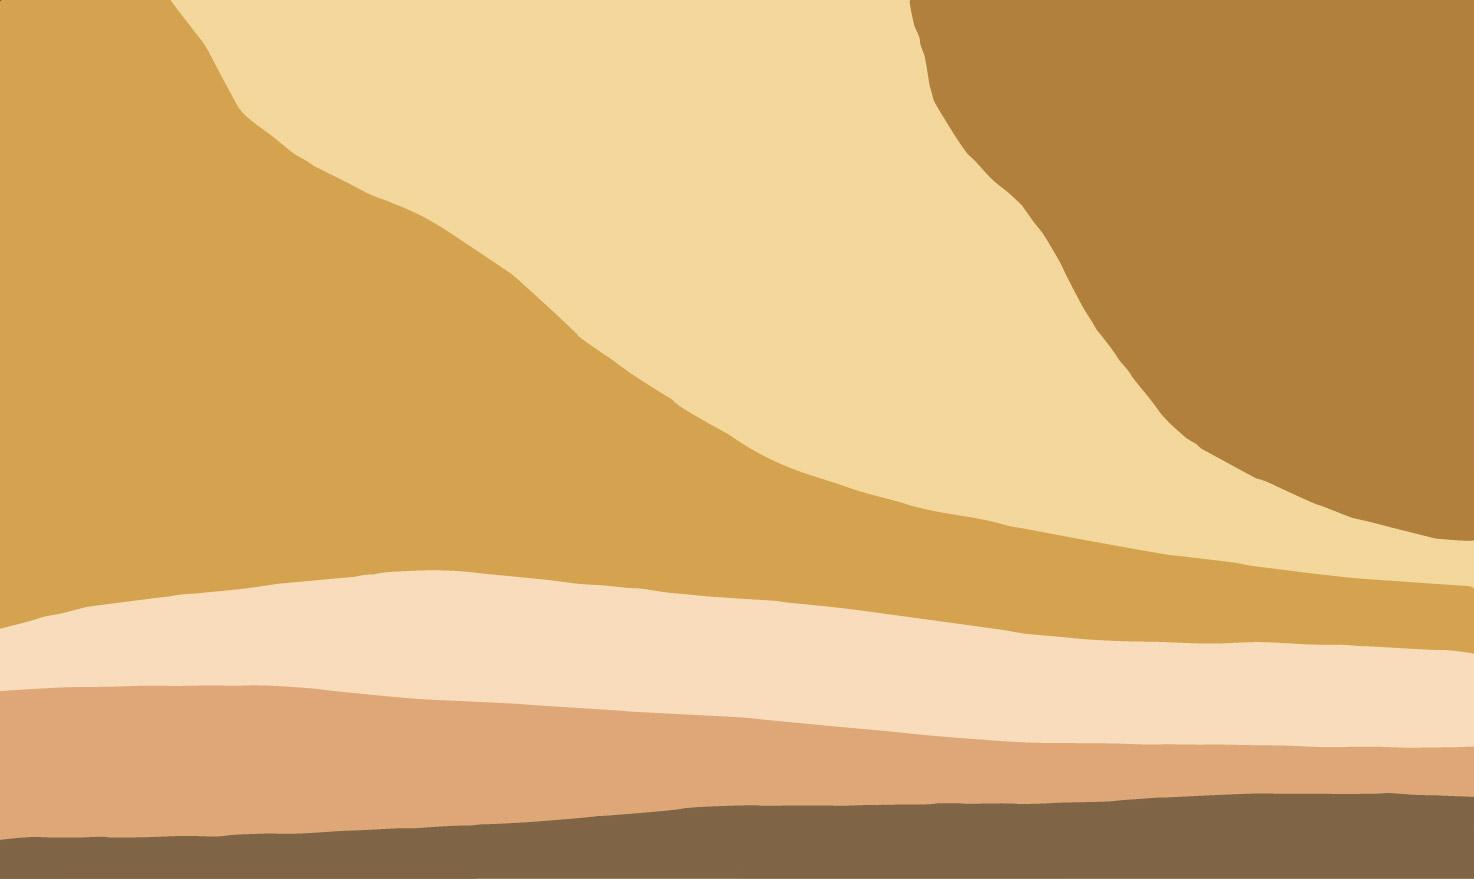 B4602_MONDI-PARALLELI-(ARIA)_OCRA-HONEY-CORAL_LR.jpg